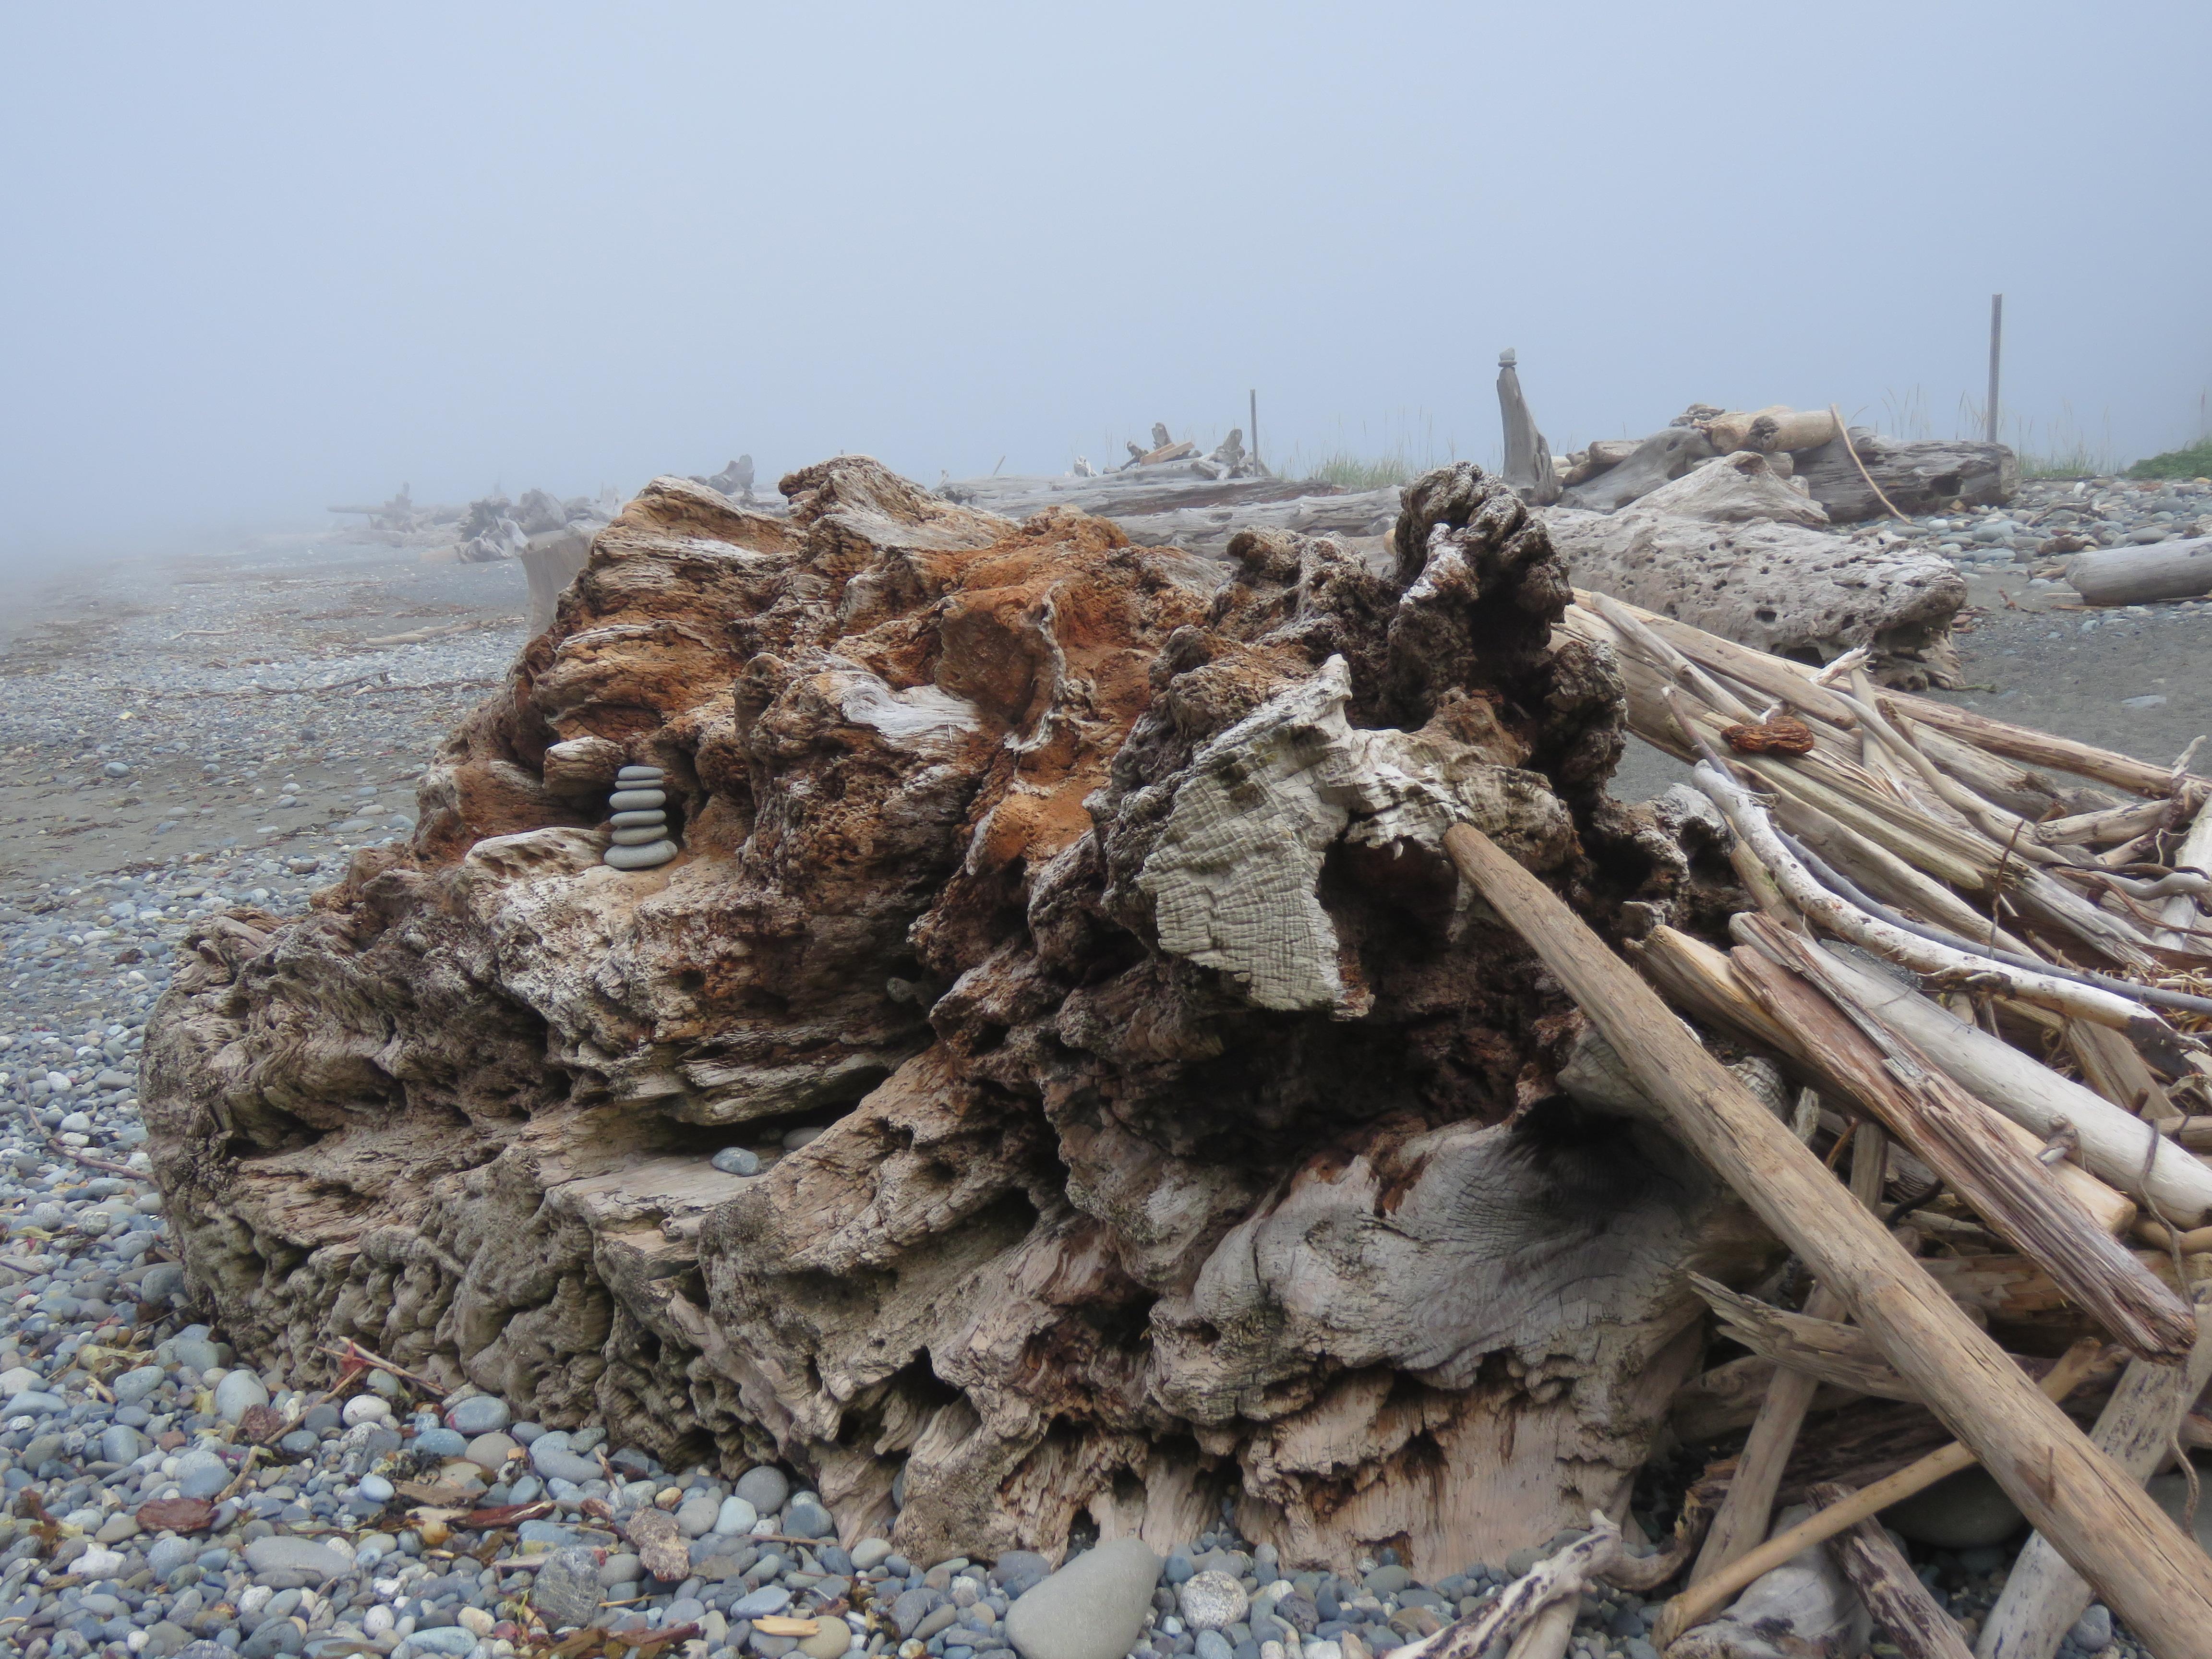 Huge driftwood log